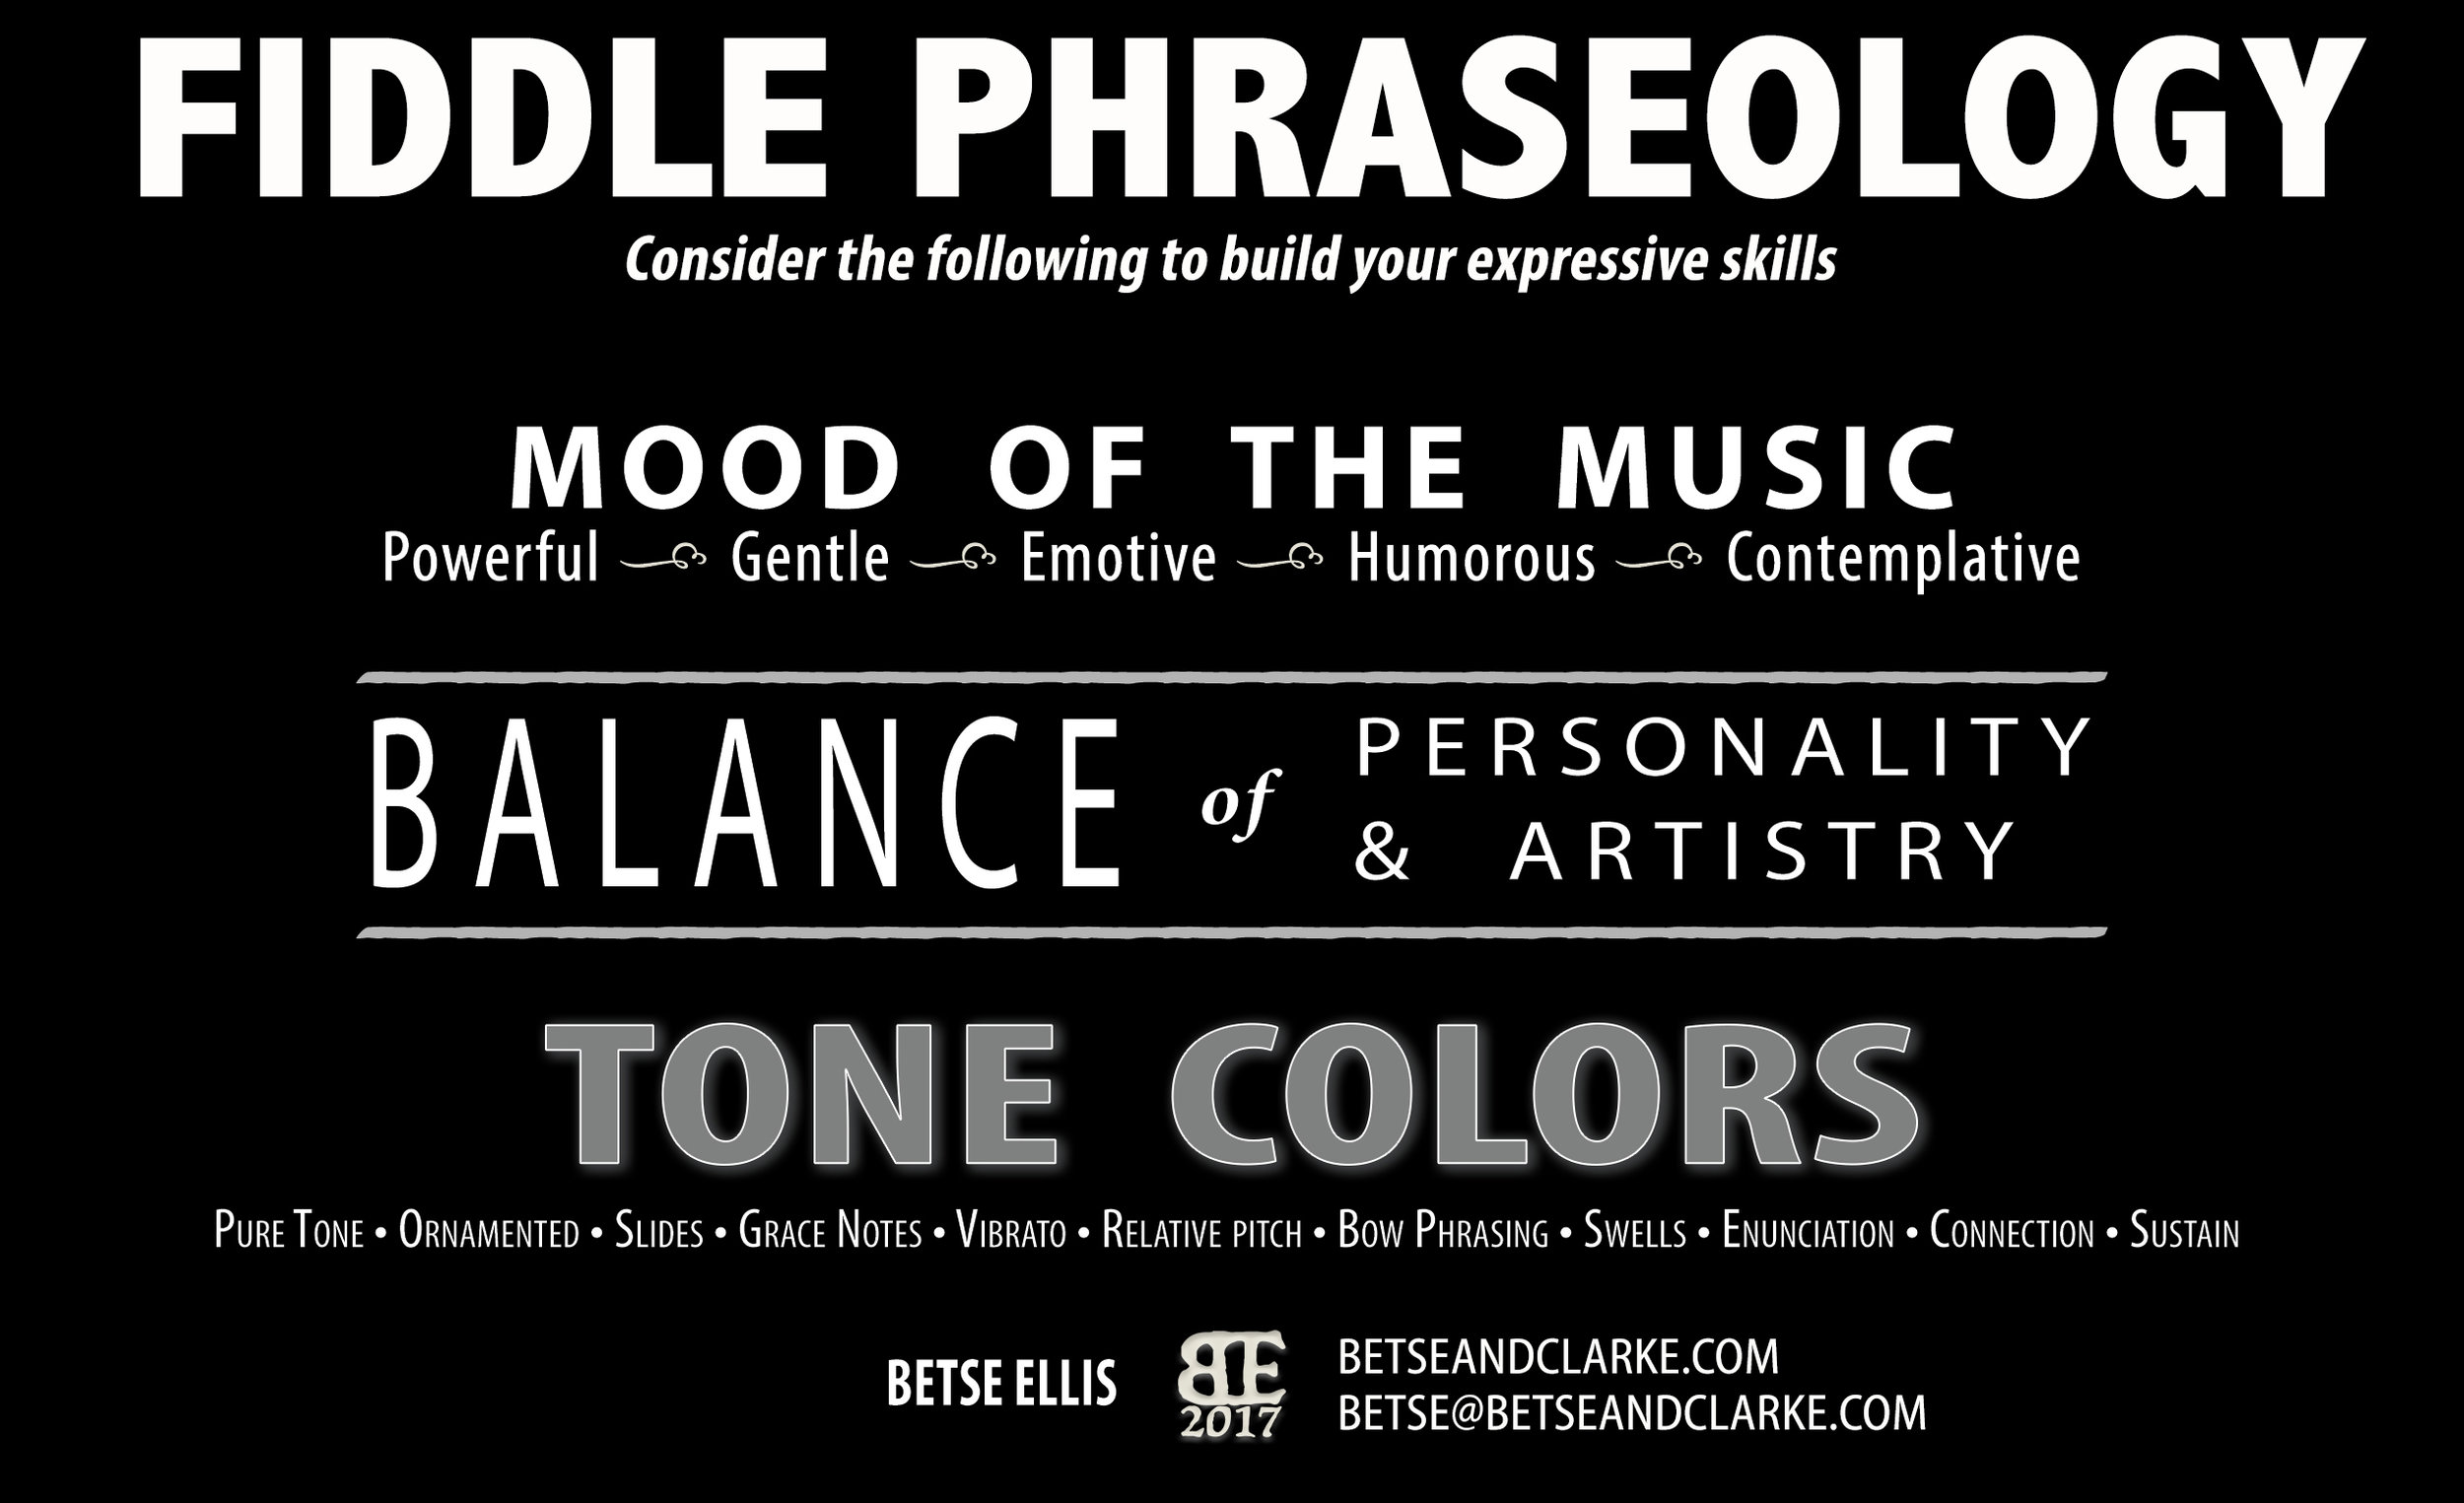 fiddle phraseology.jpg